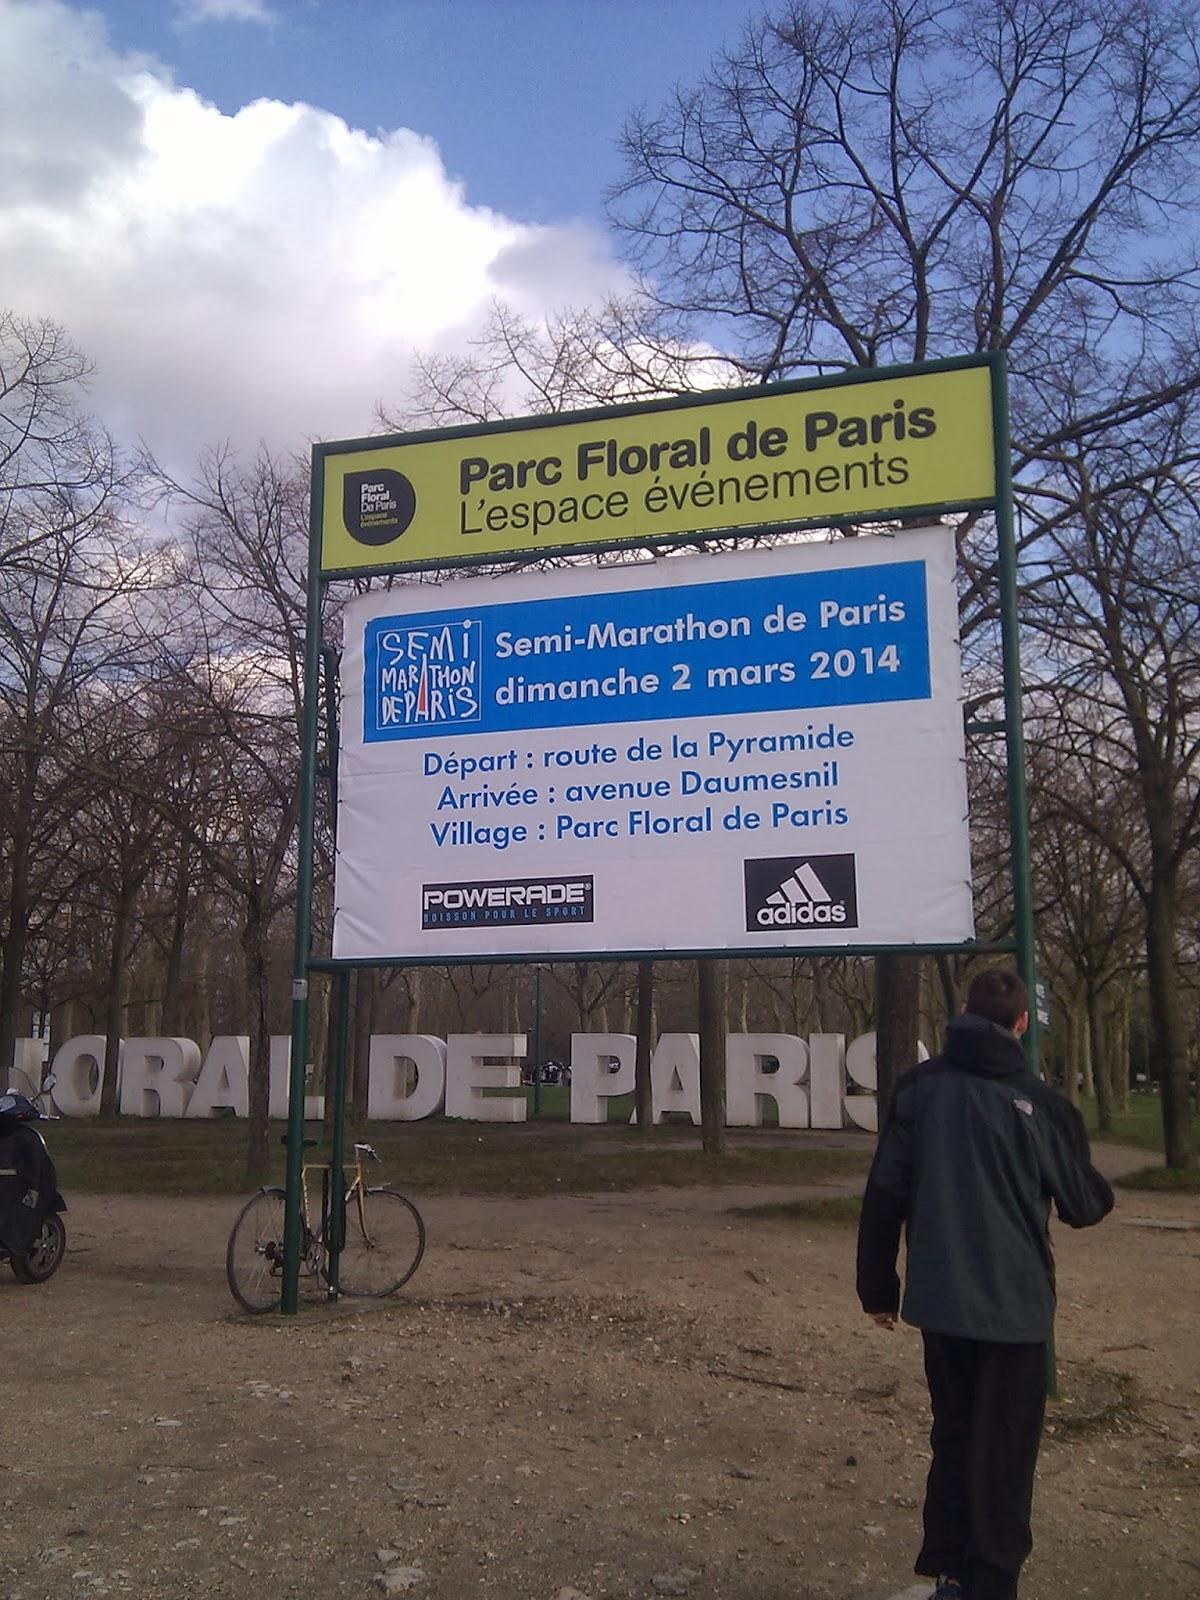 http://lafilleauxbasketsroses.blogspot.com/2014/03/cr-du-semi-marathon-de-paris-2014.html